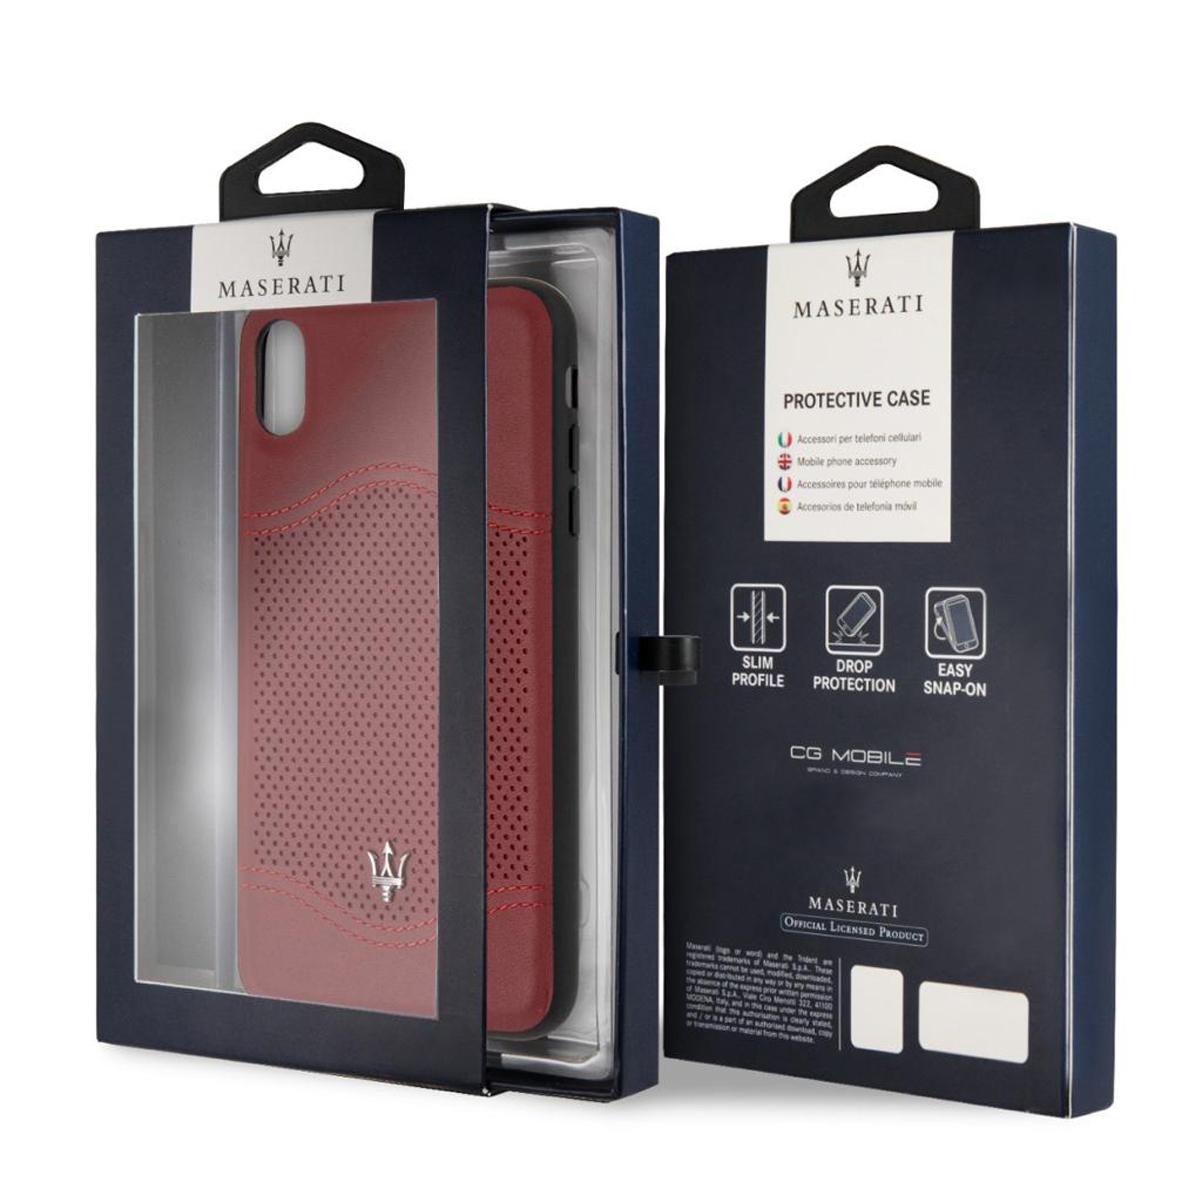 کاور   سی جی موبایل کد 33301 مناسب برای گوشی موبایل اپل iphone xs max    thumb 2 3